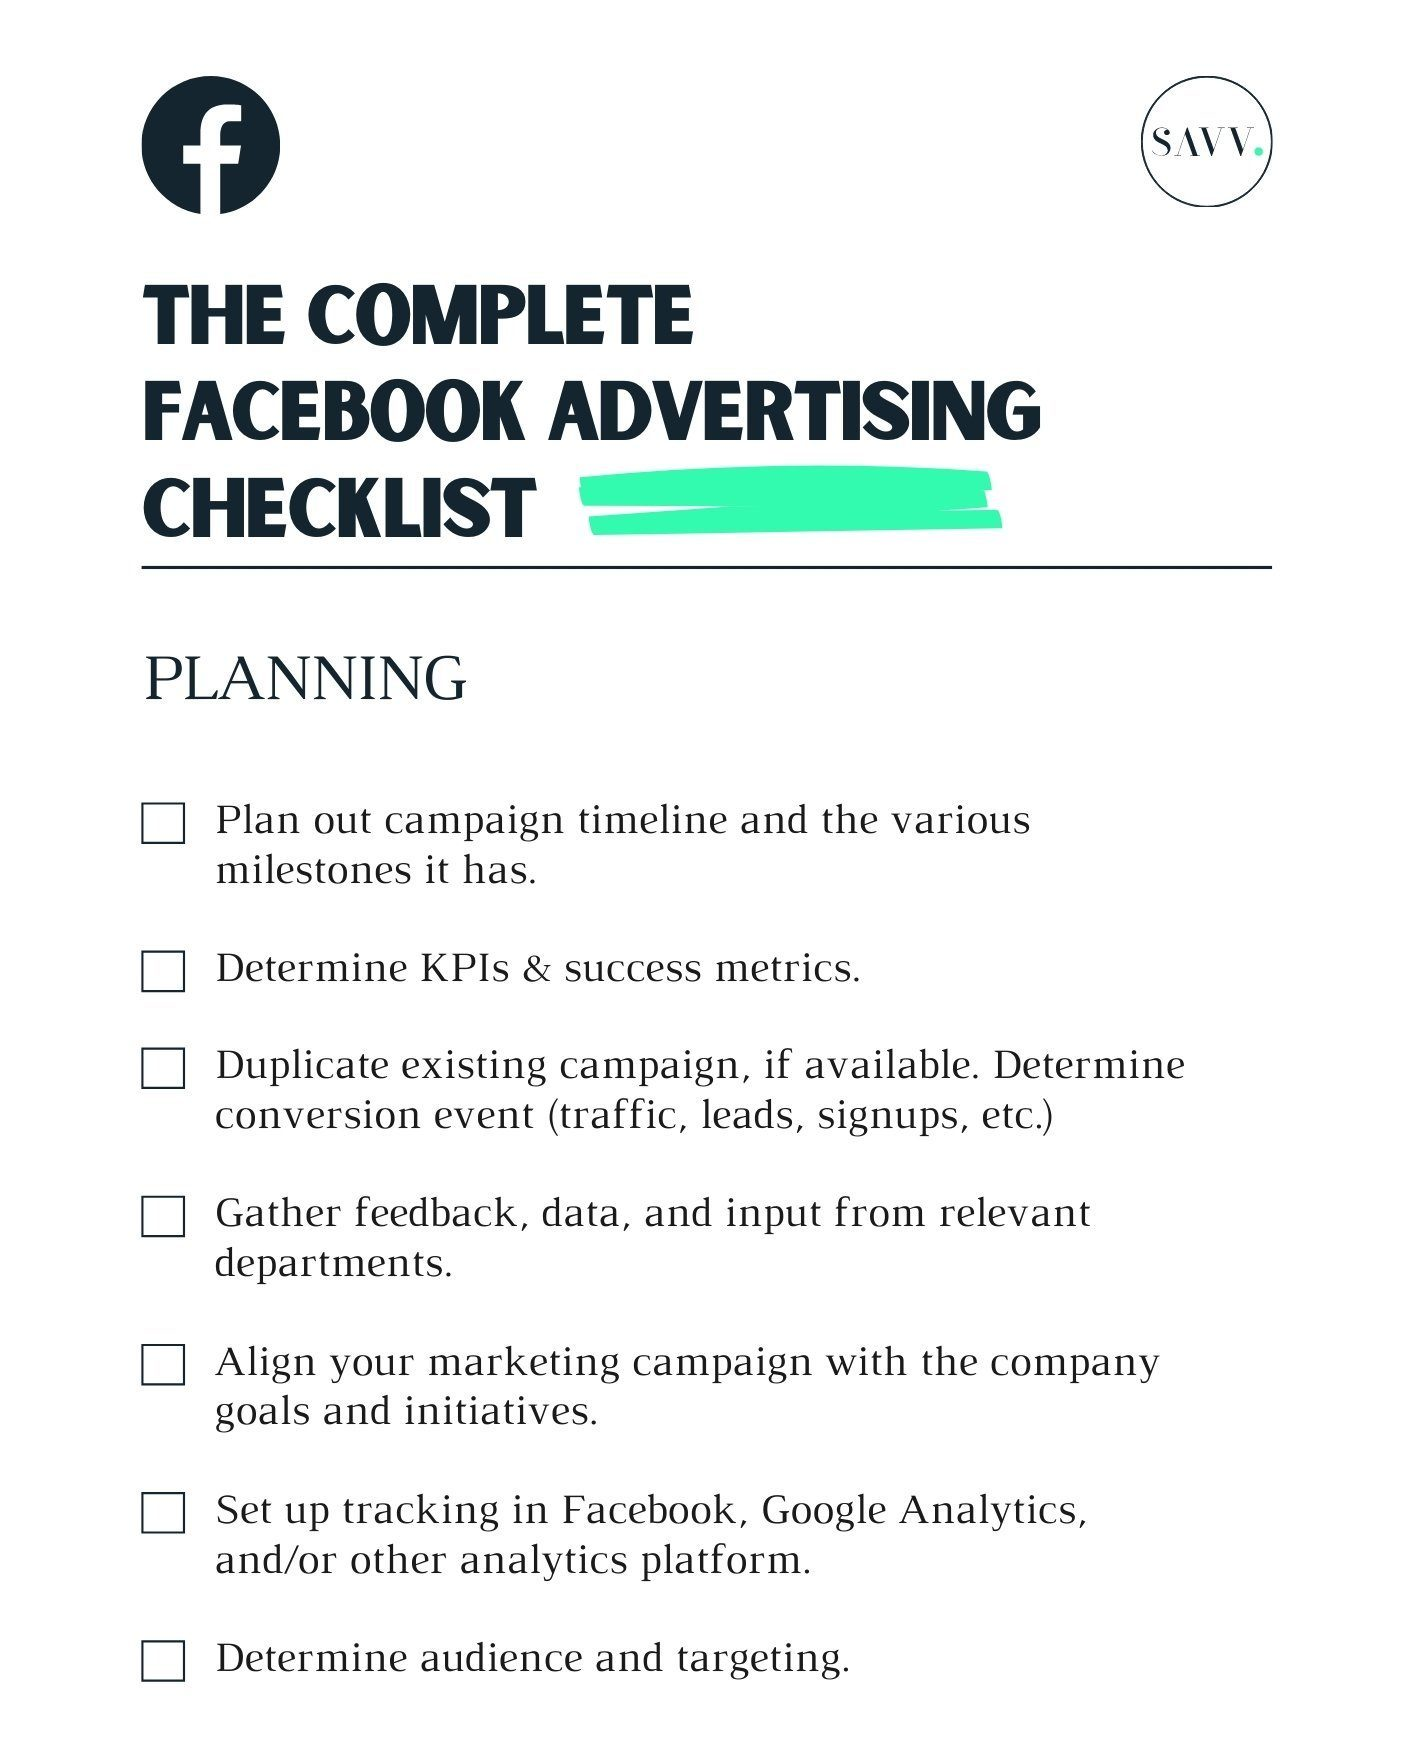 Facebook Advertising Checklist